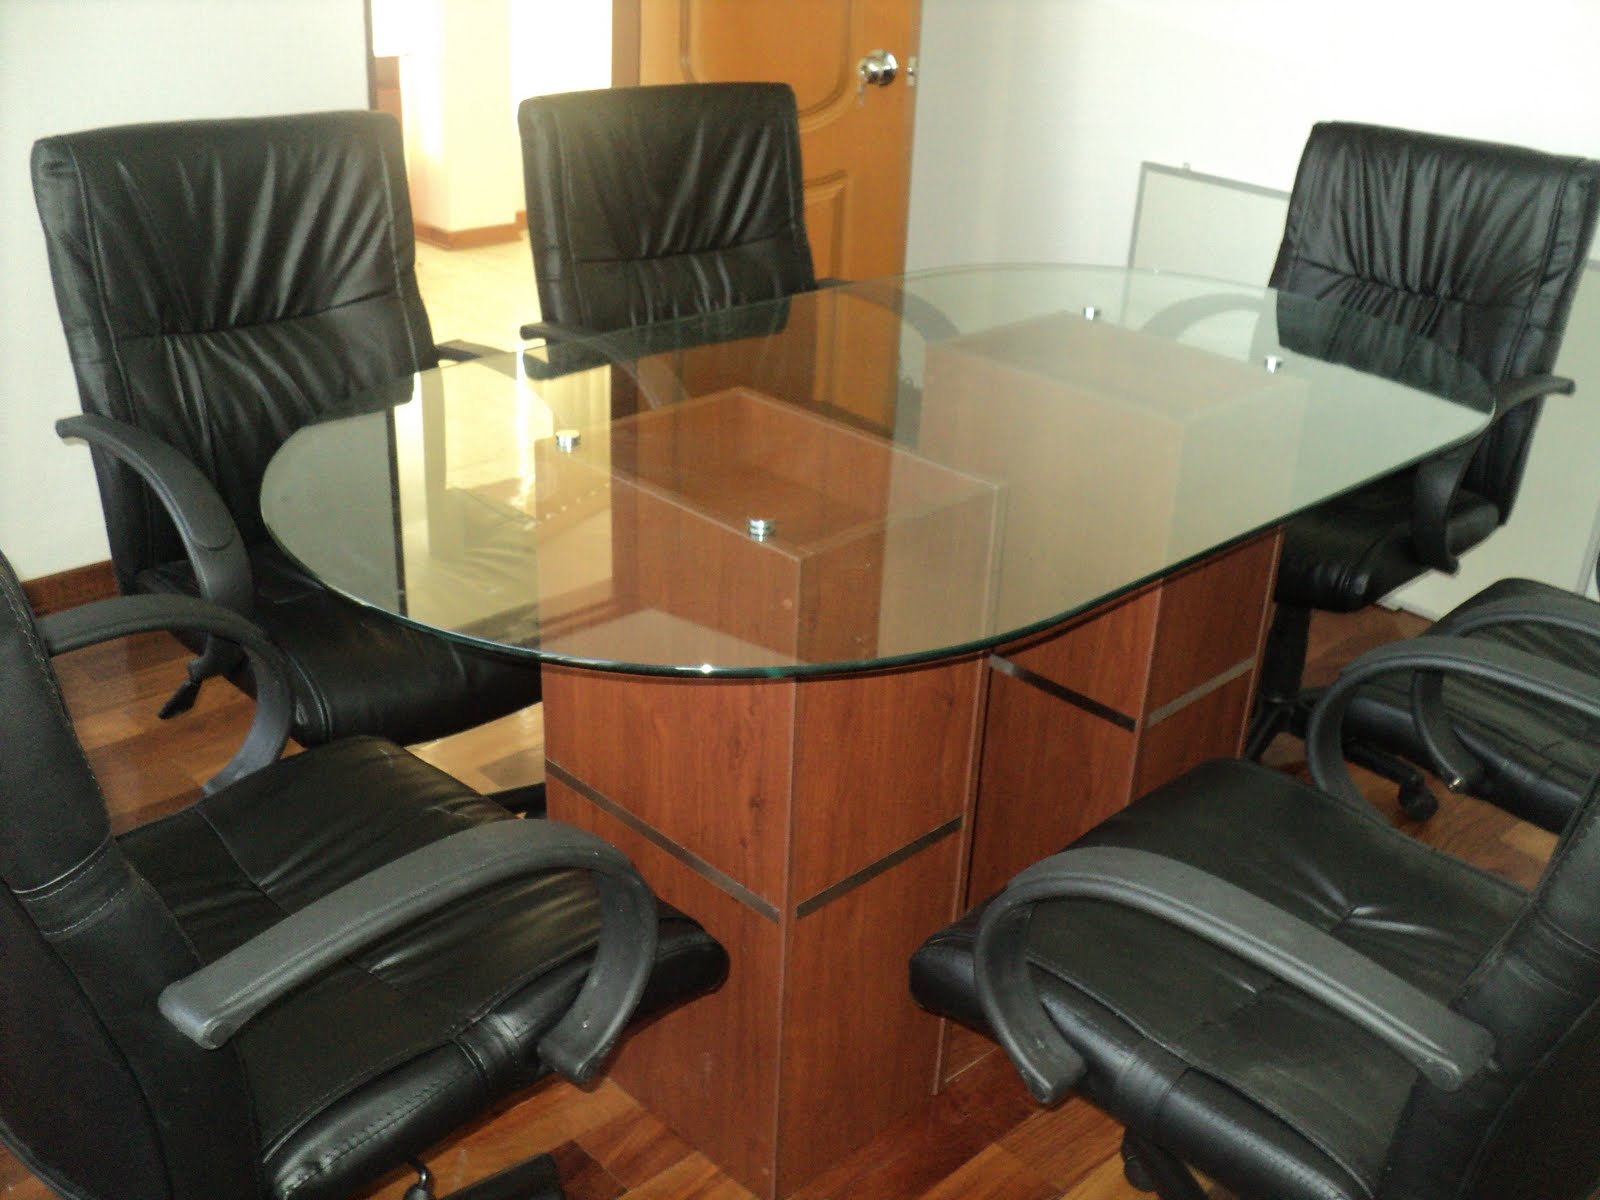 E y g proyectos integrales muebles en melamina aluminio for Suministro de oficina